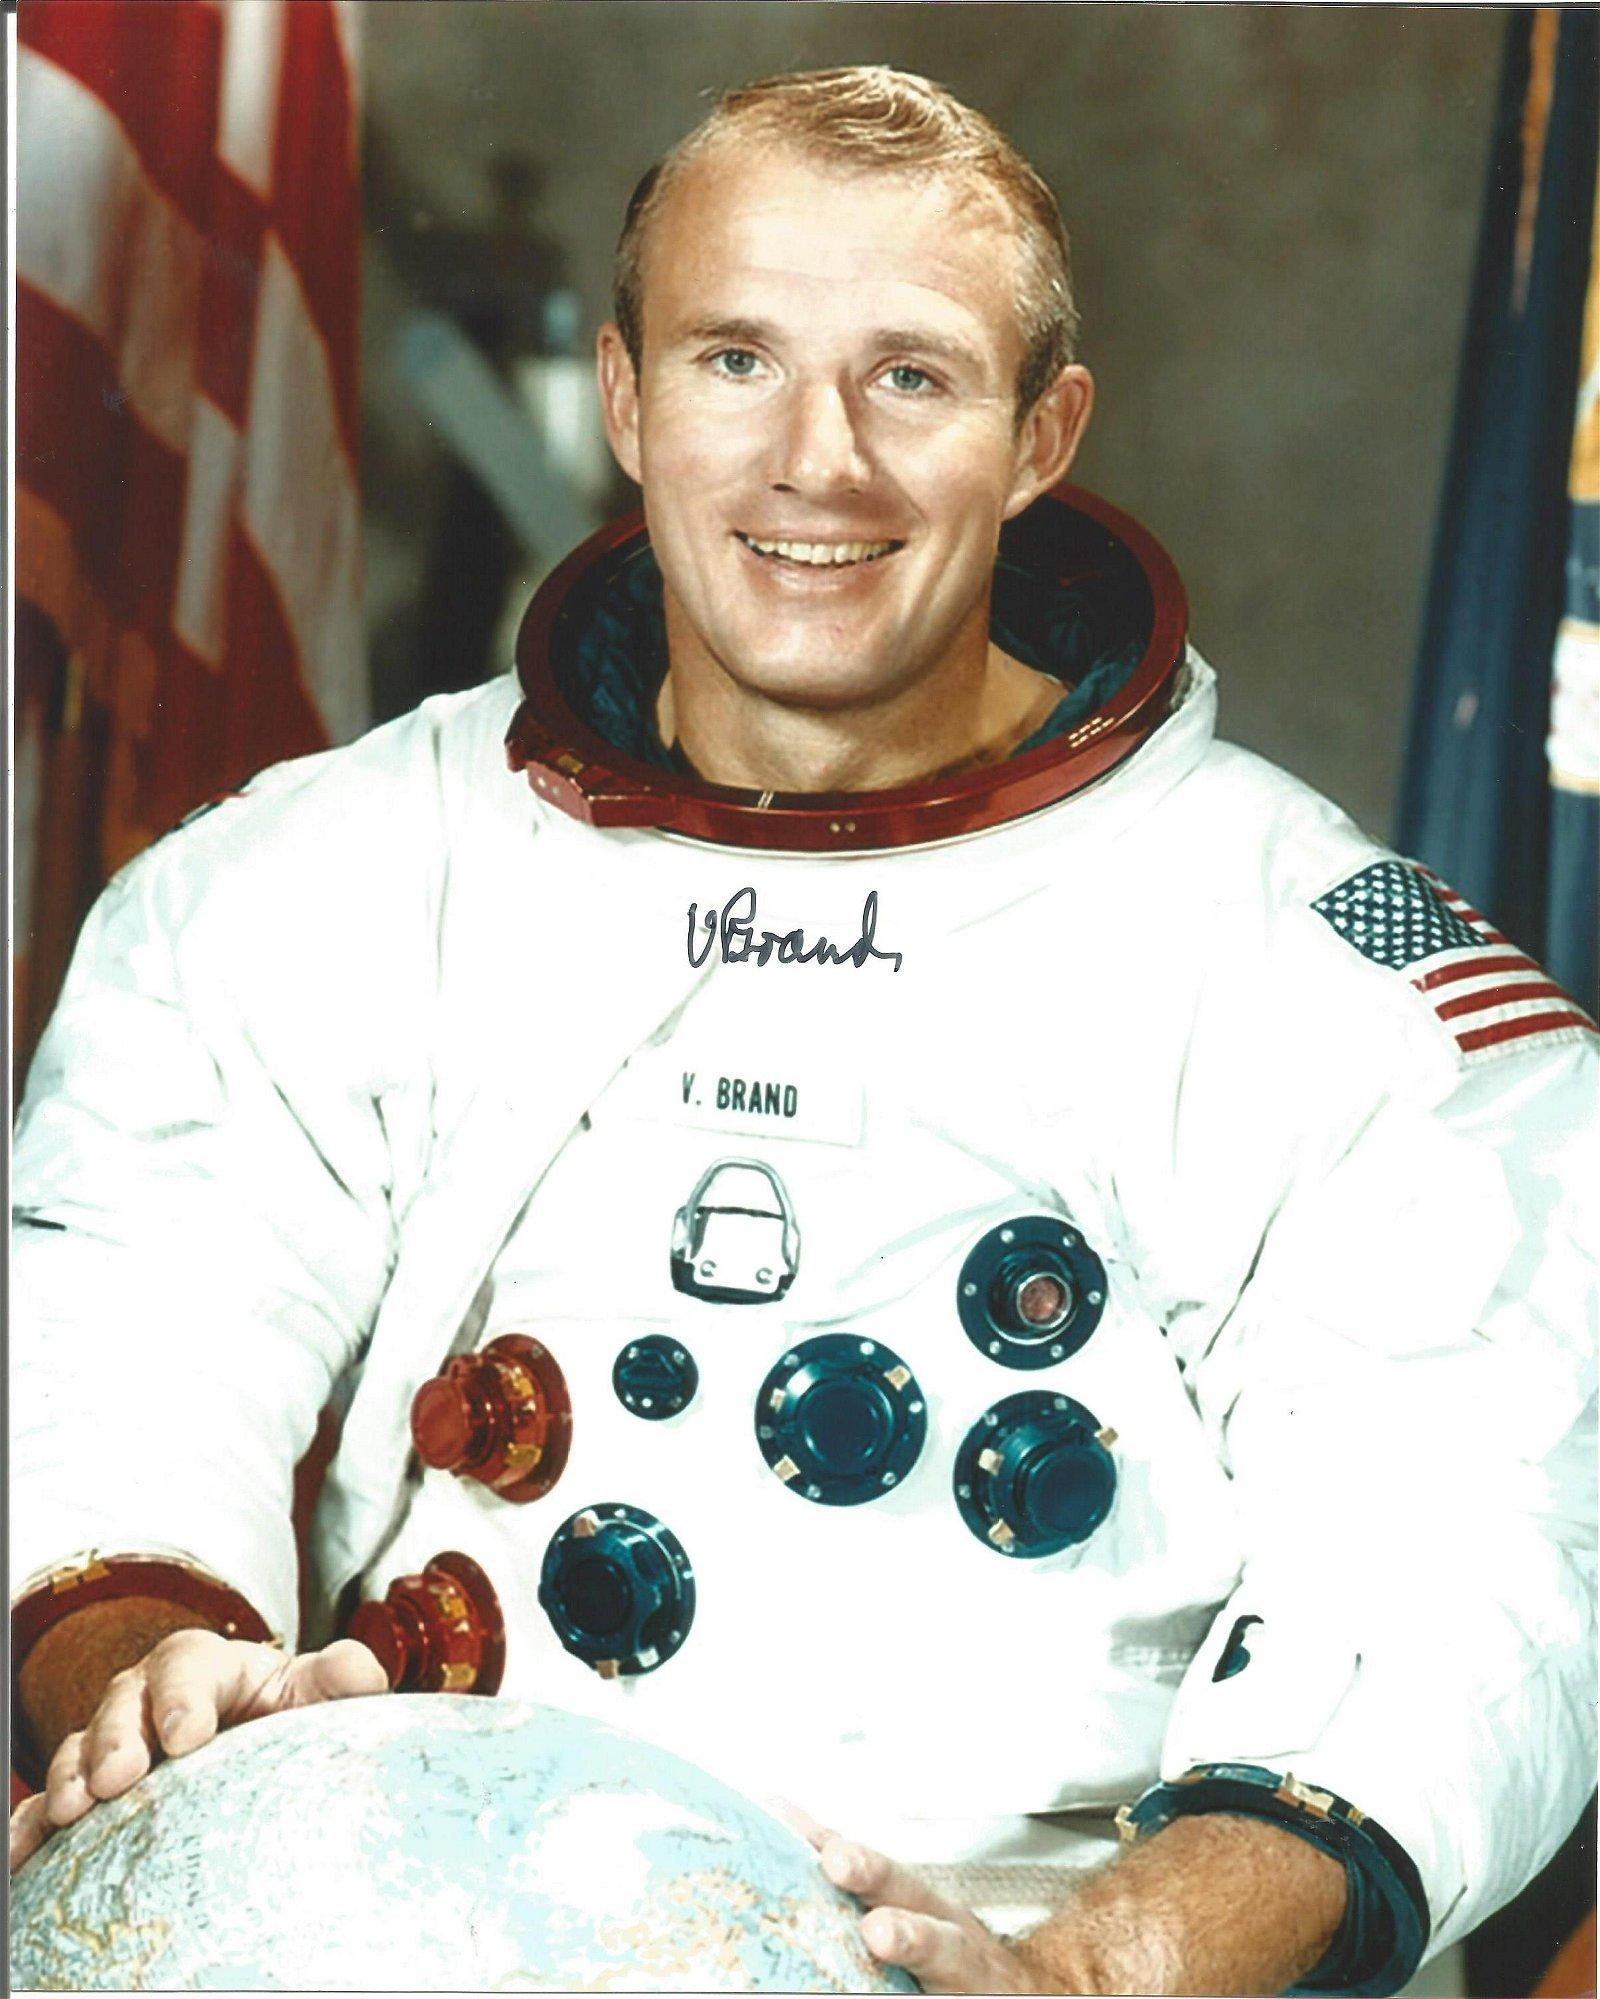 Vance Brand Astronaut signed 10x8 colour photo. Good